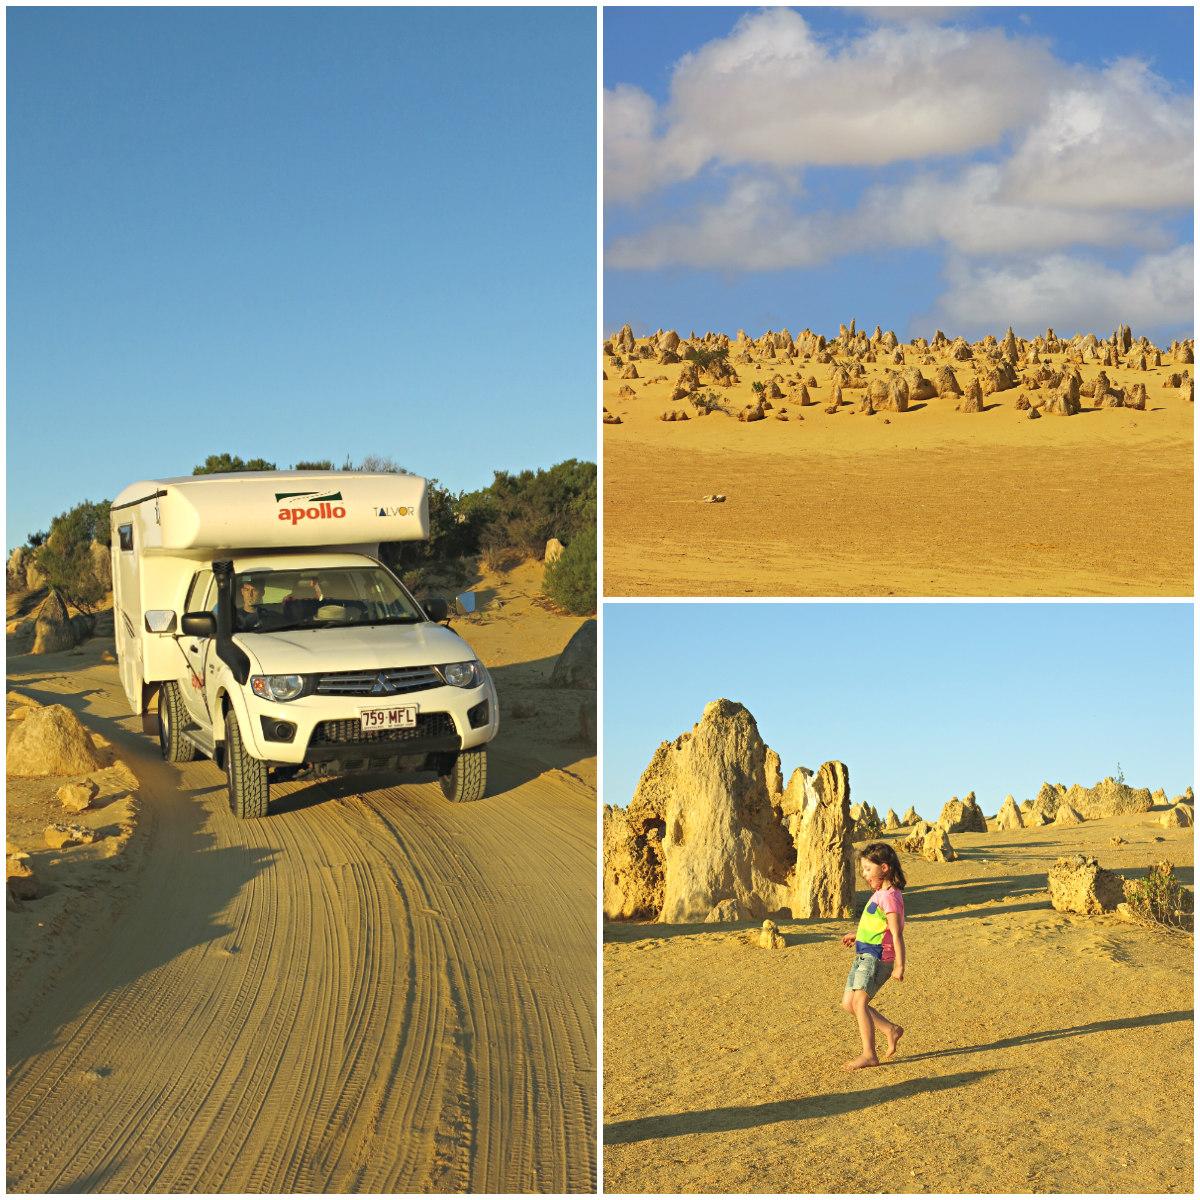 Westküste-Australien-Naumburg-Pinacle-Deserts-Kollage